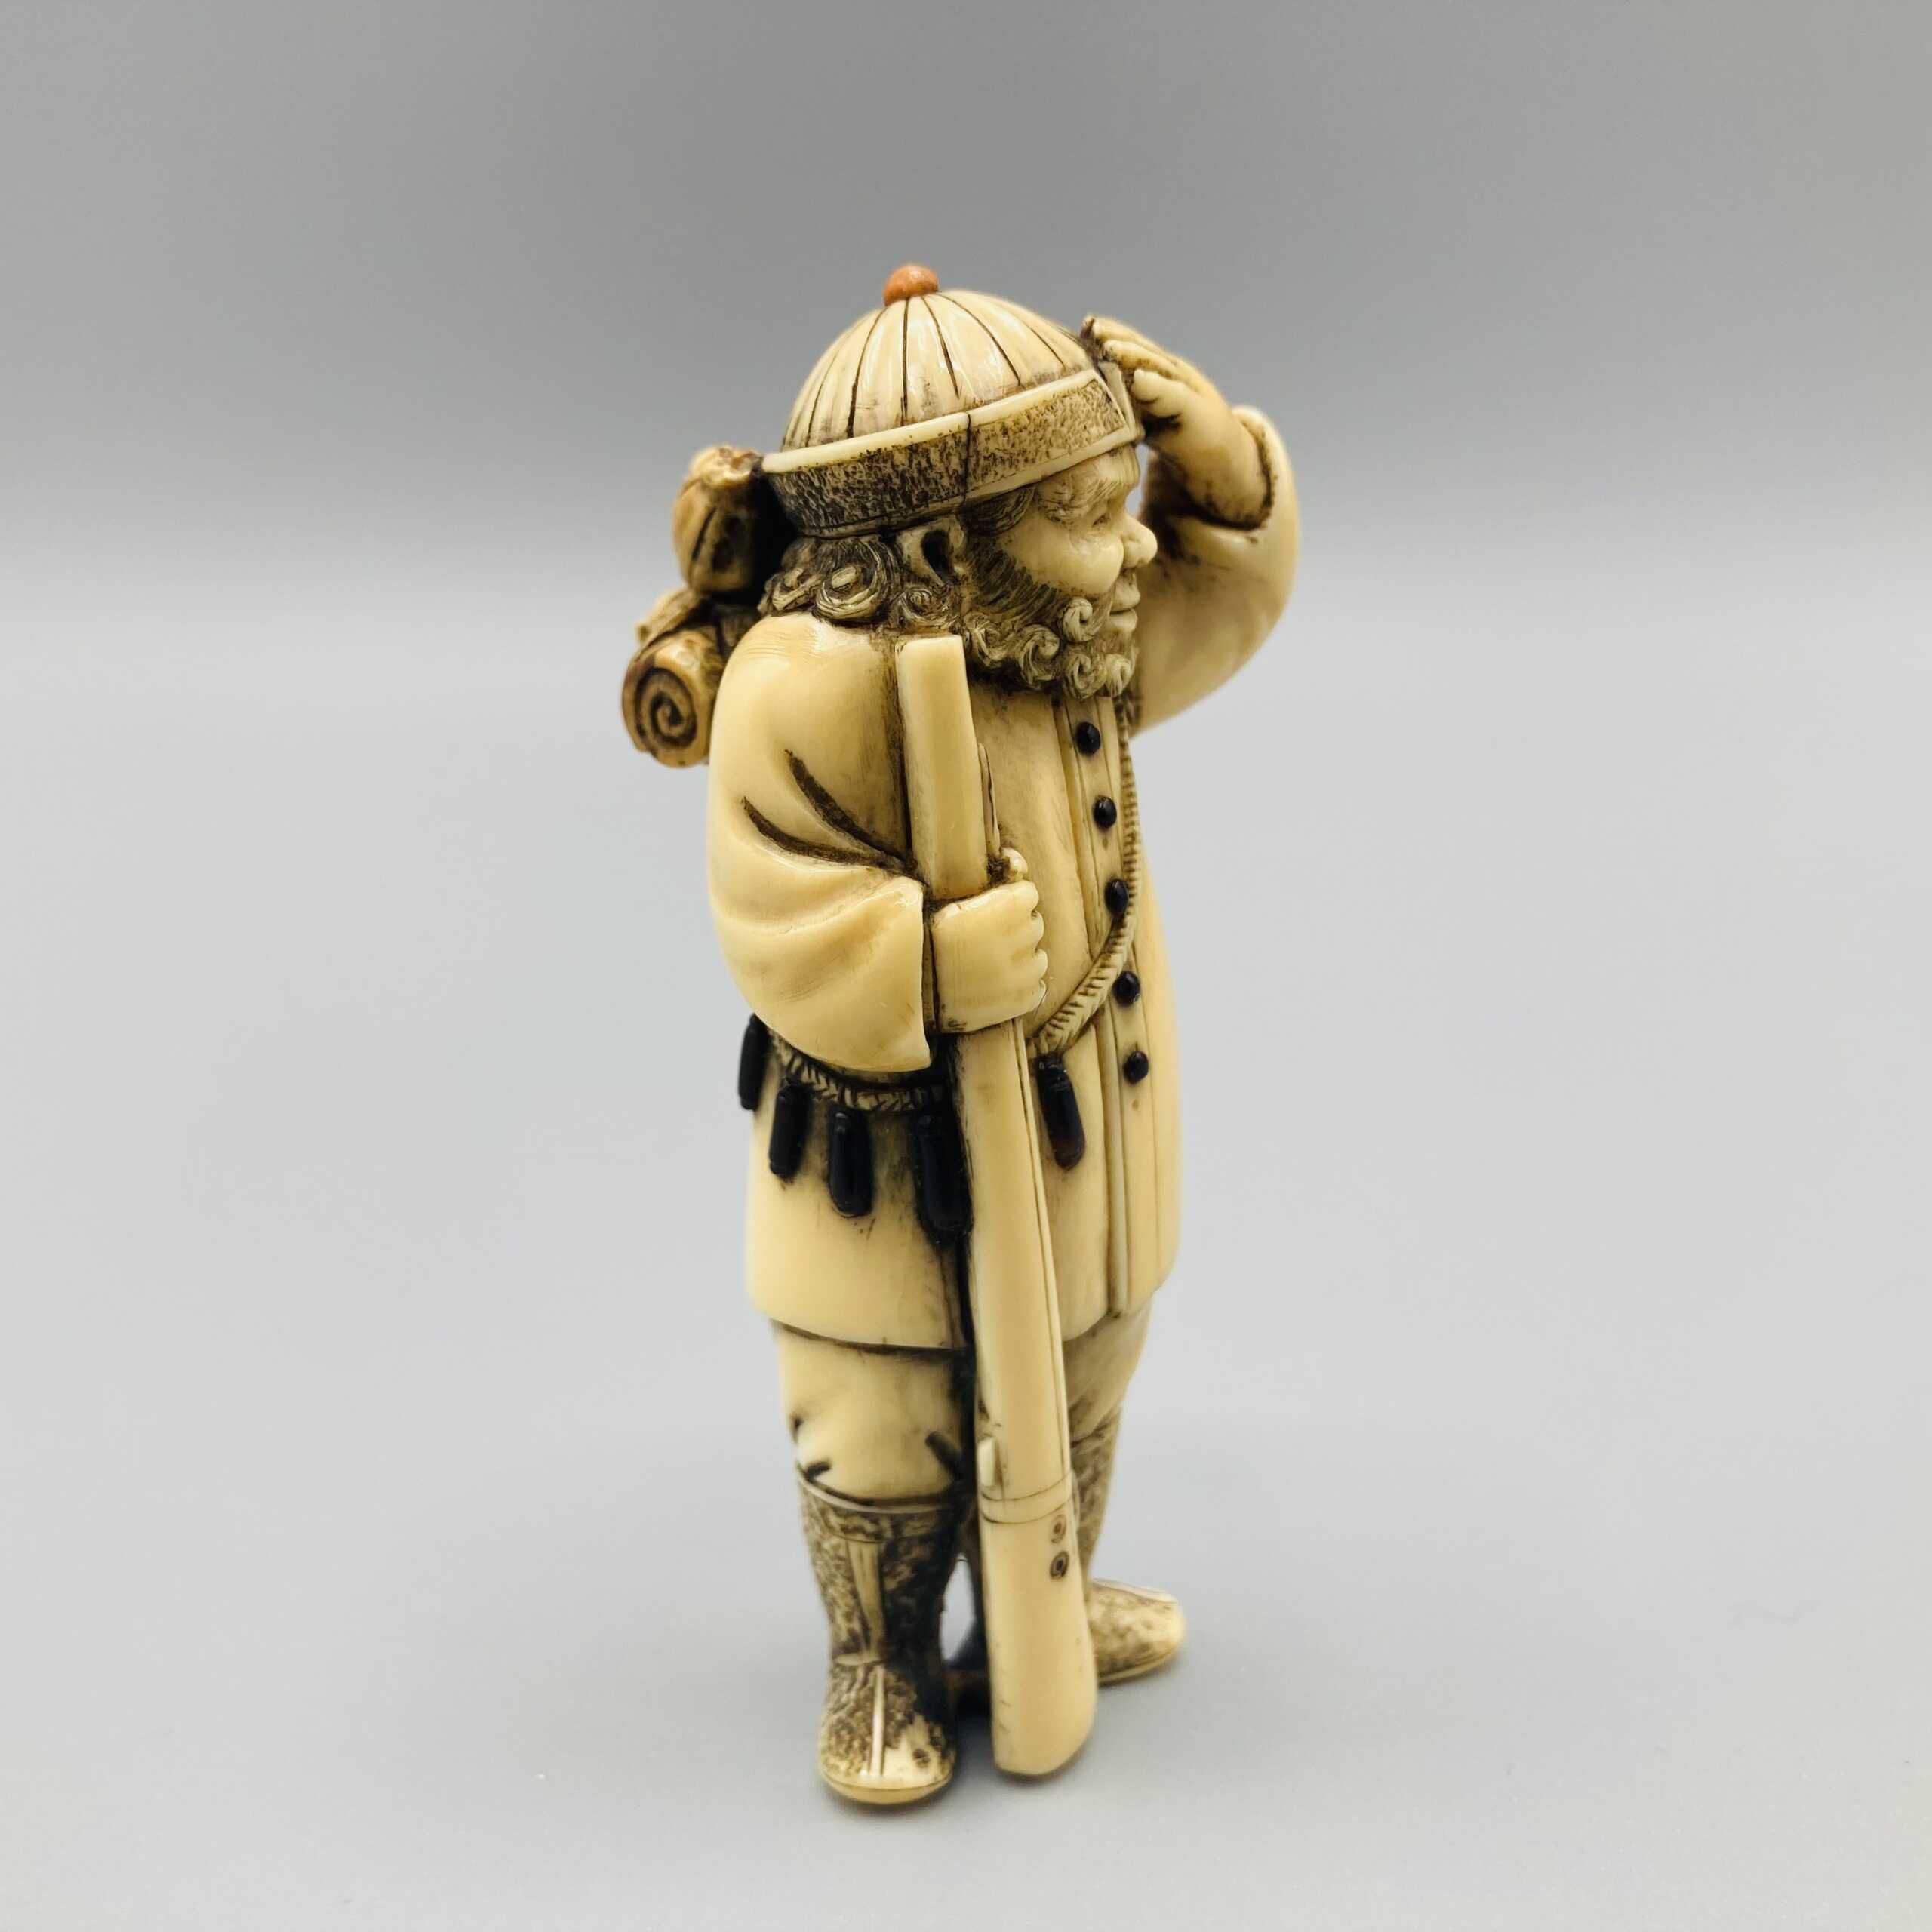 Chokusai ivory netsuke of FM Pinto 2